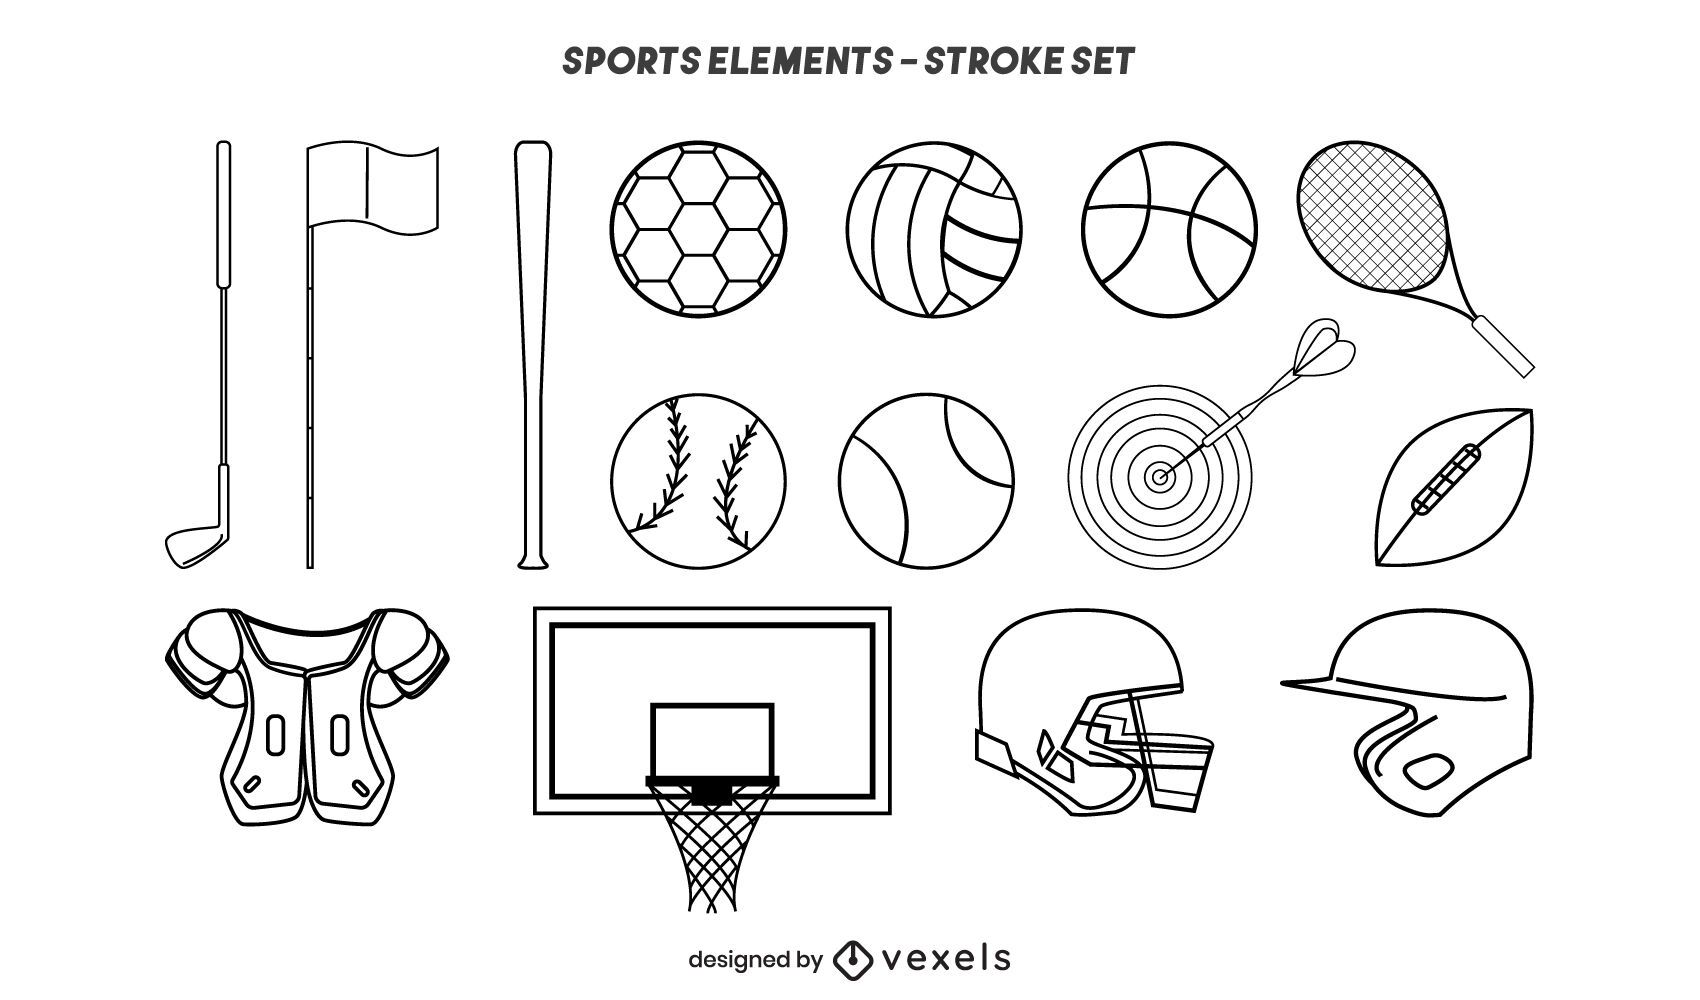 Sports elements stroke set